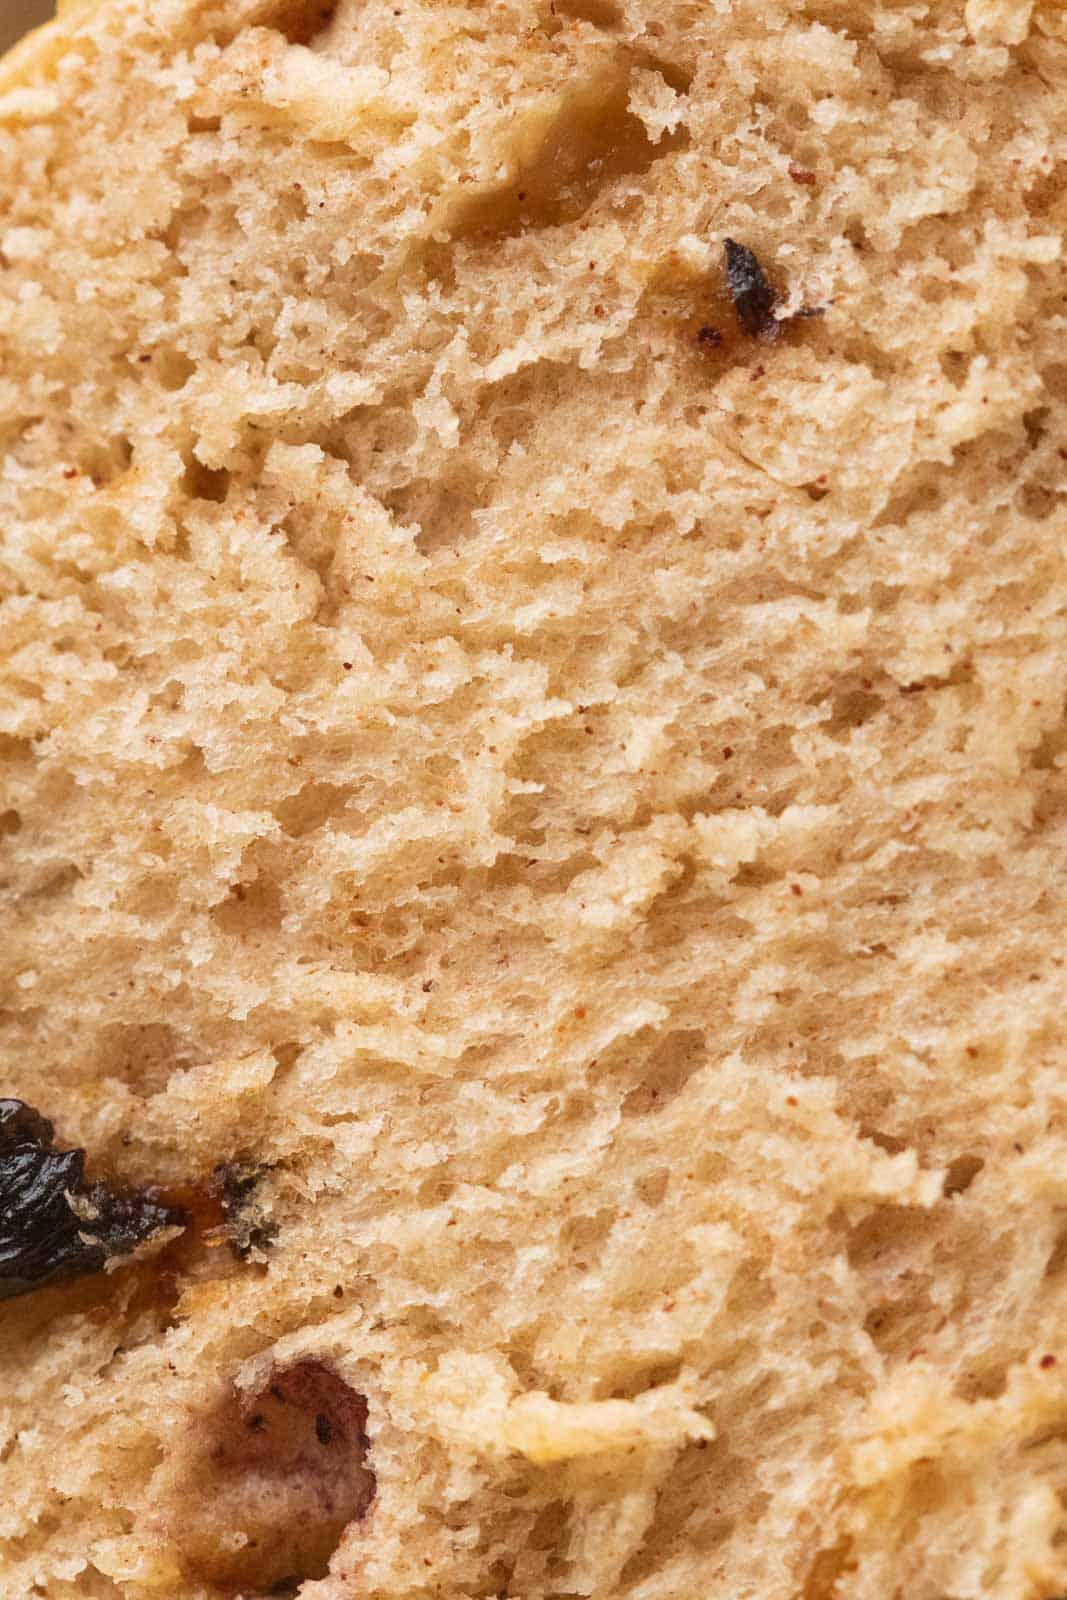 Closeup of the crumb of hot cross buns